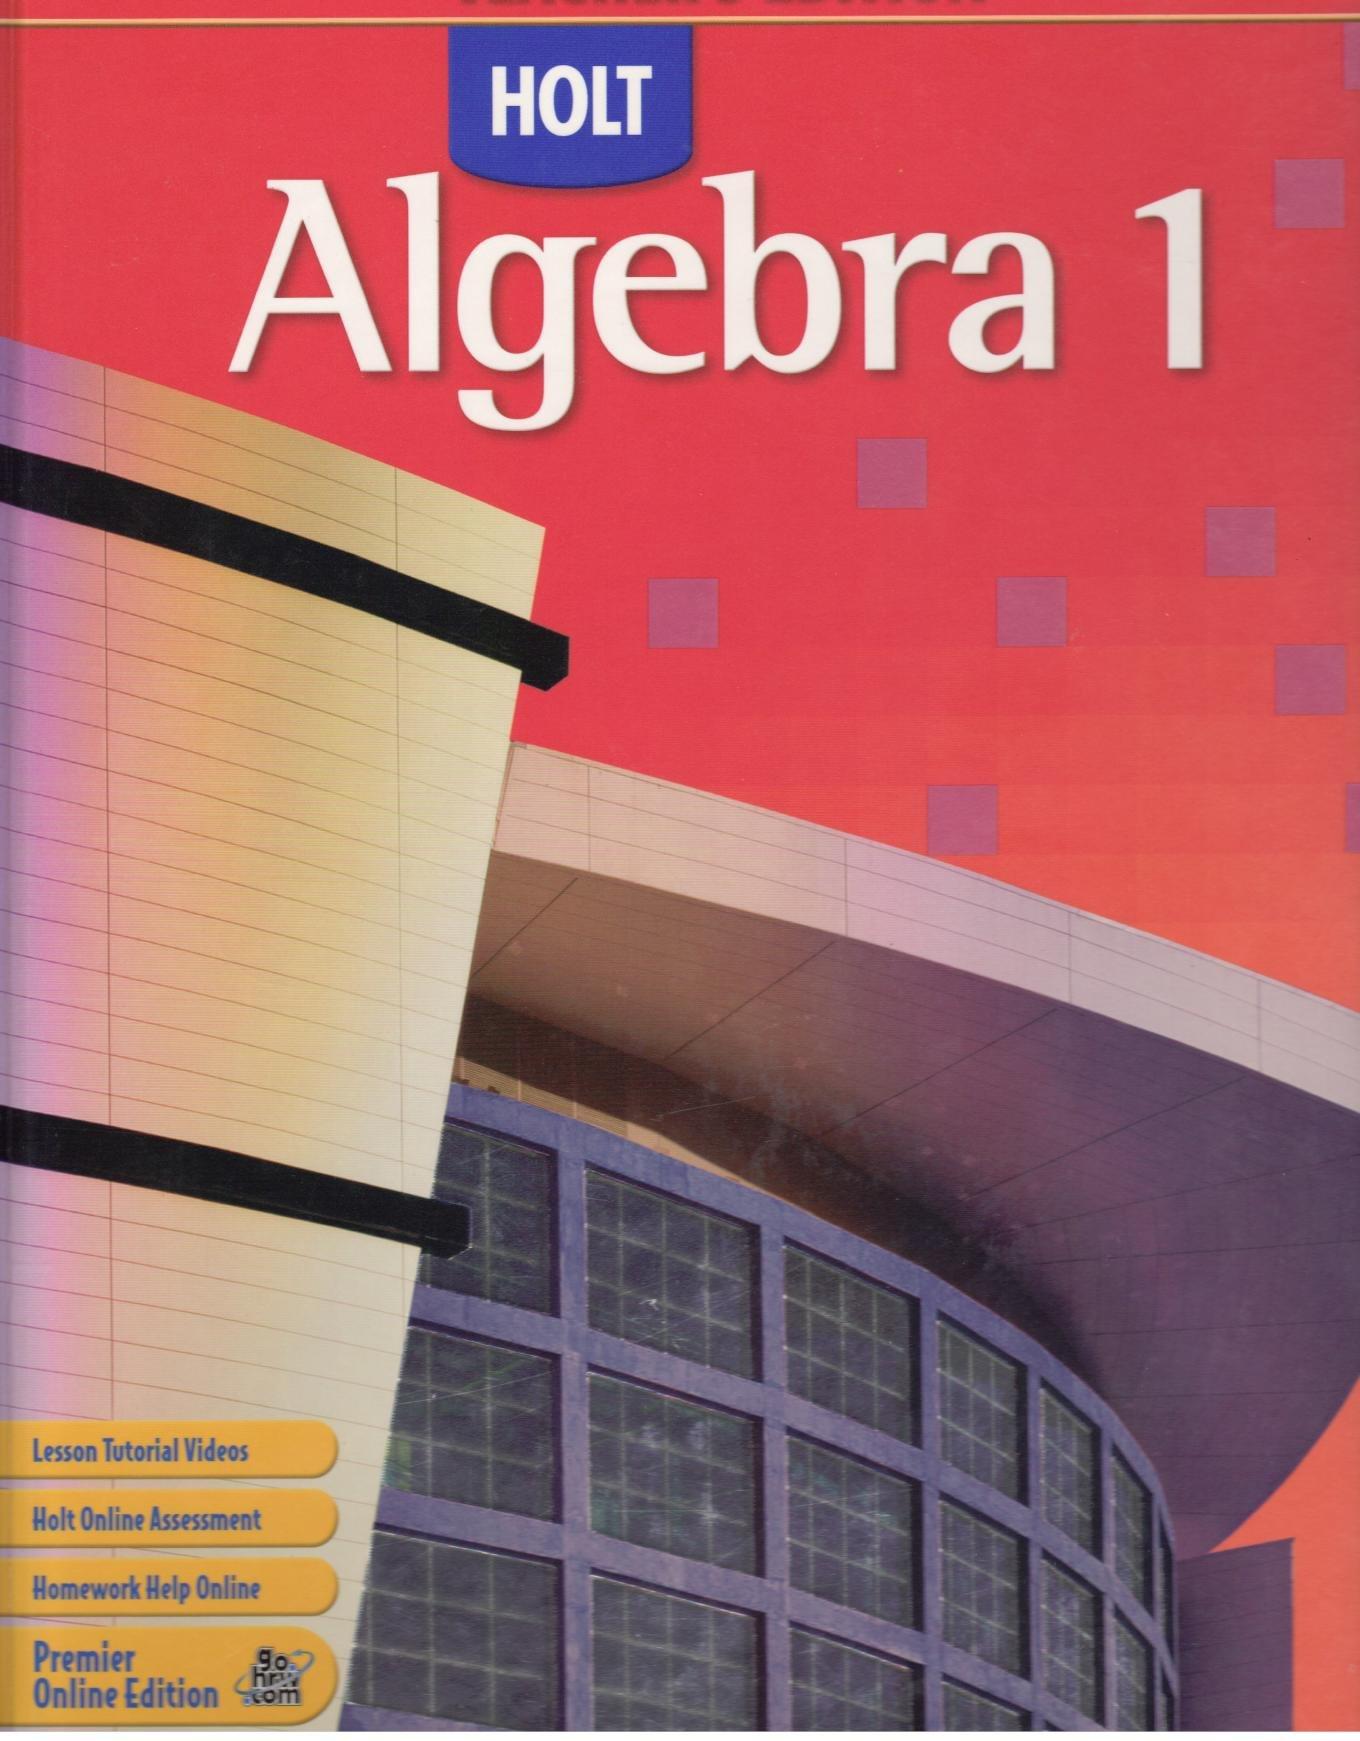 Holt Algebra 1 Teachers Edition EDWARD B BURGER 9790030385321 – Holt Algebra 1 Worksheet Answers